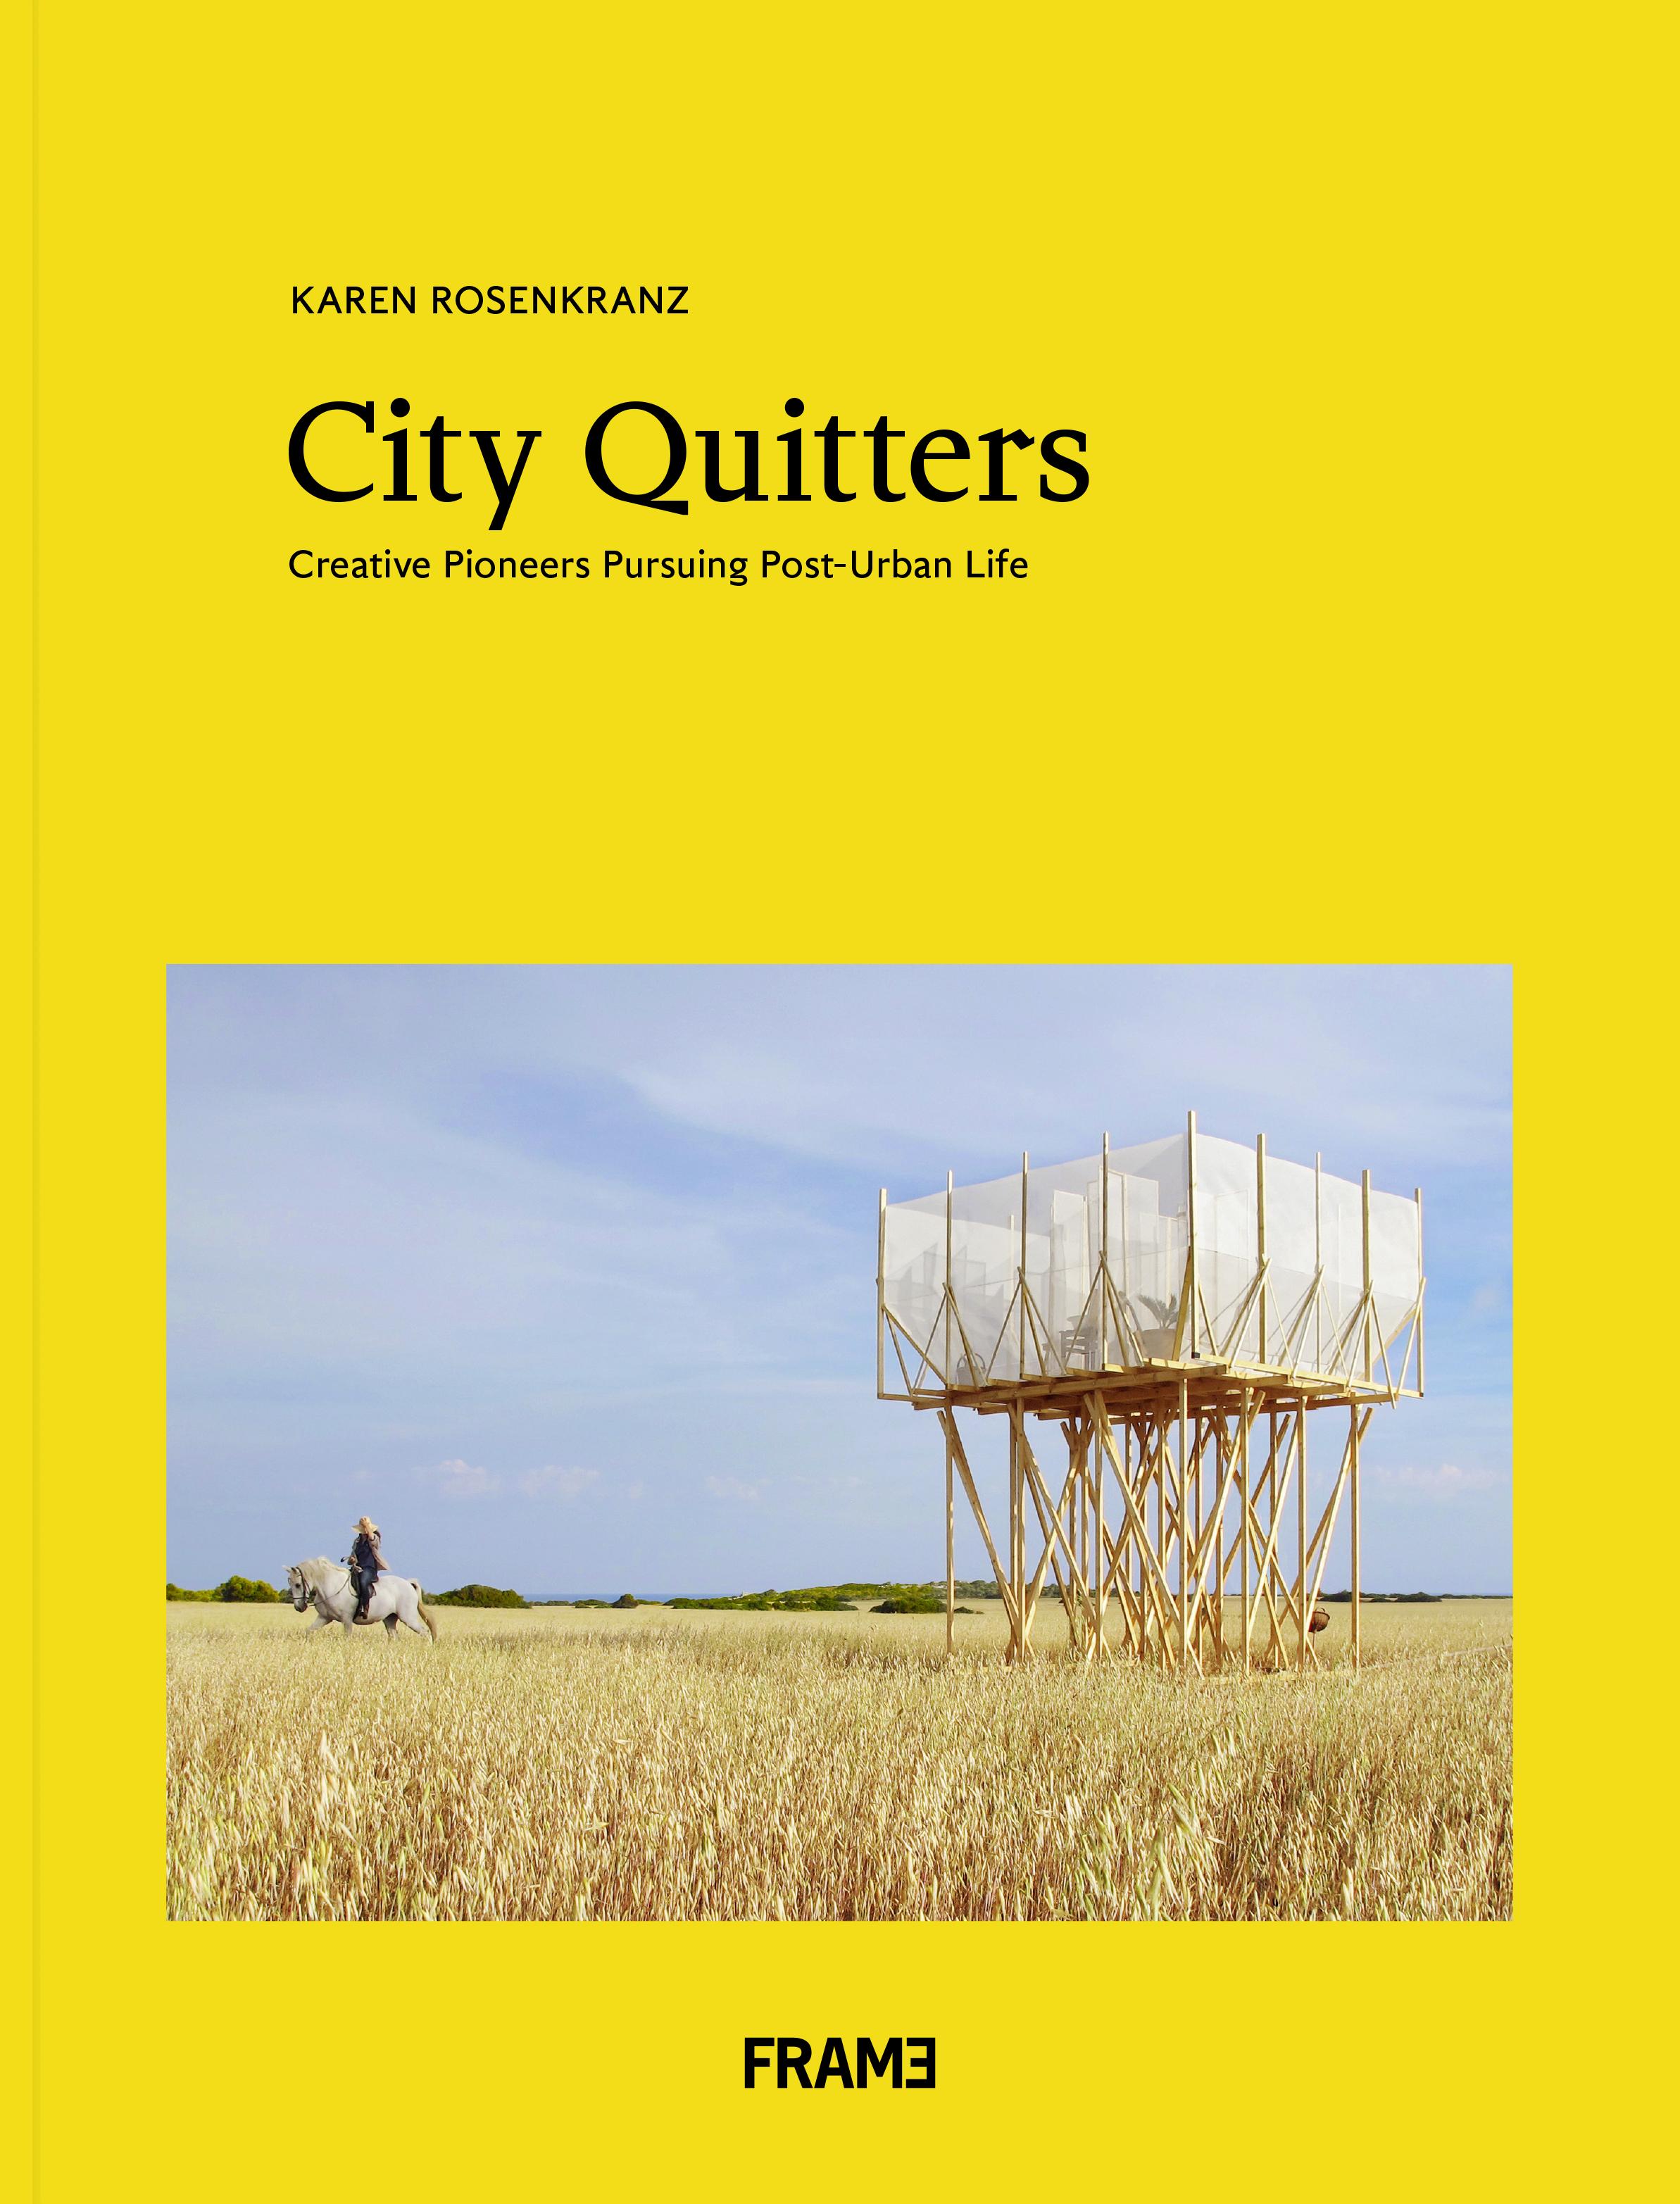 Cover of City Quitters by Karen Rosenkranz. Photo: Gartnerfuglen, Mariana de Delás.